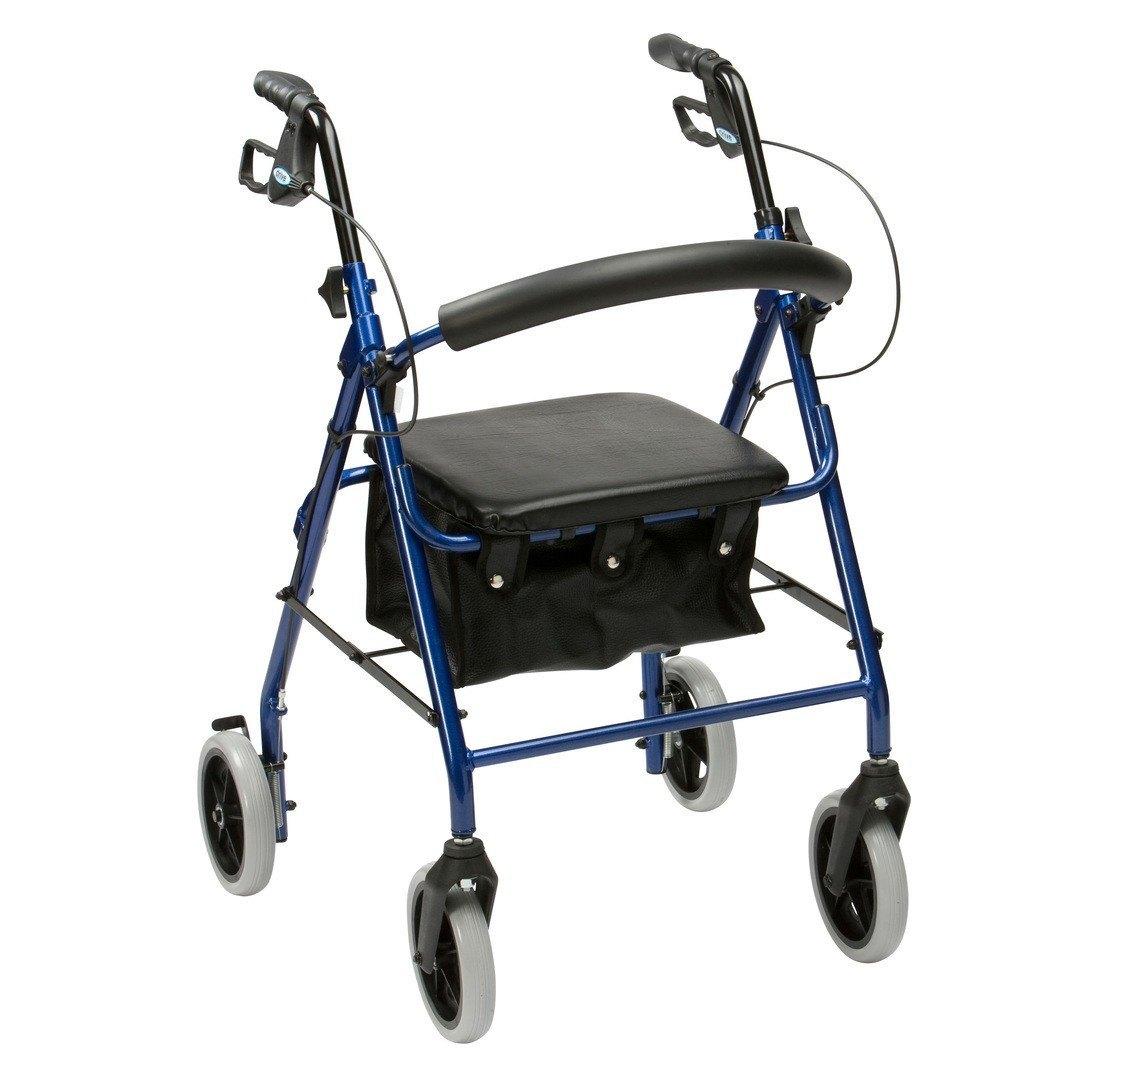 drive-medical-rollators-rollator-ligero-de-aluminio-con-ruedas-r6